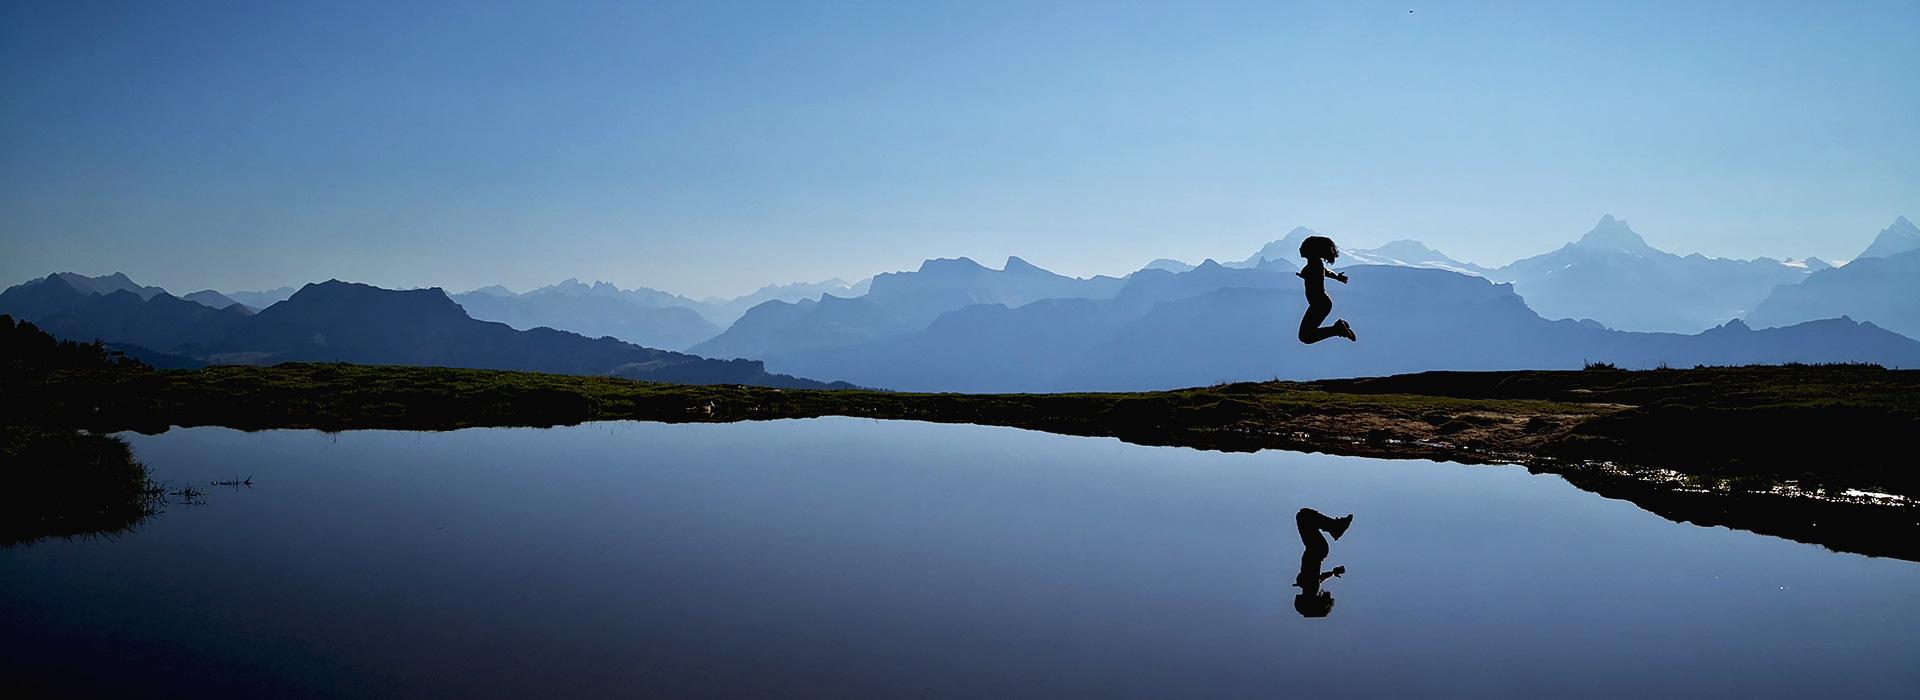 senstations-voyage-accueil-blog-voyage-suisse-mountaine